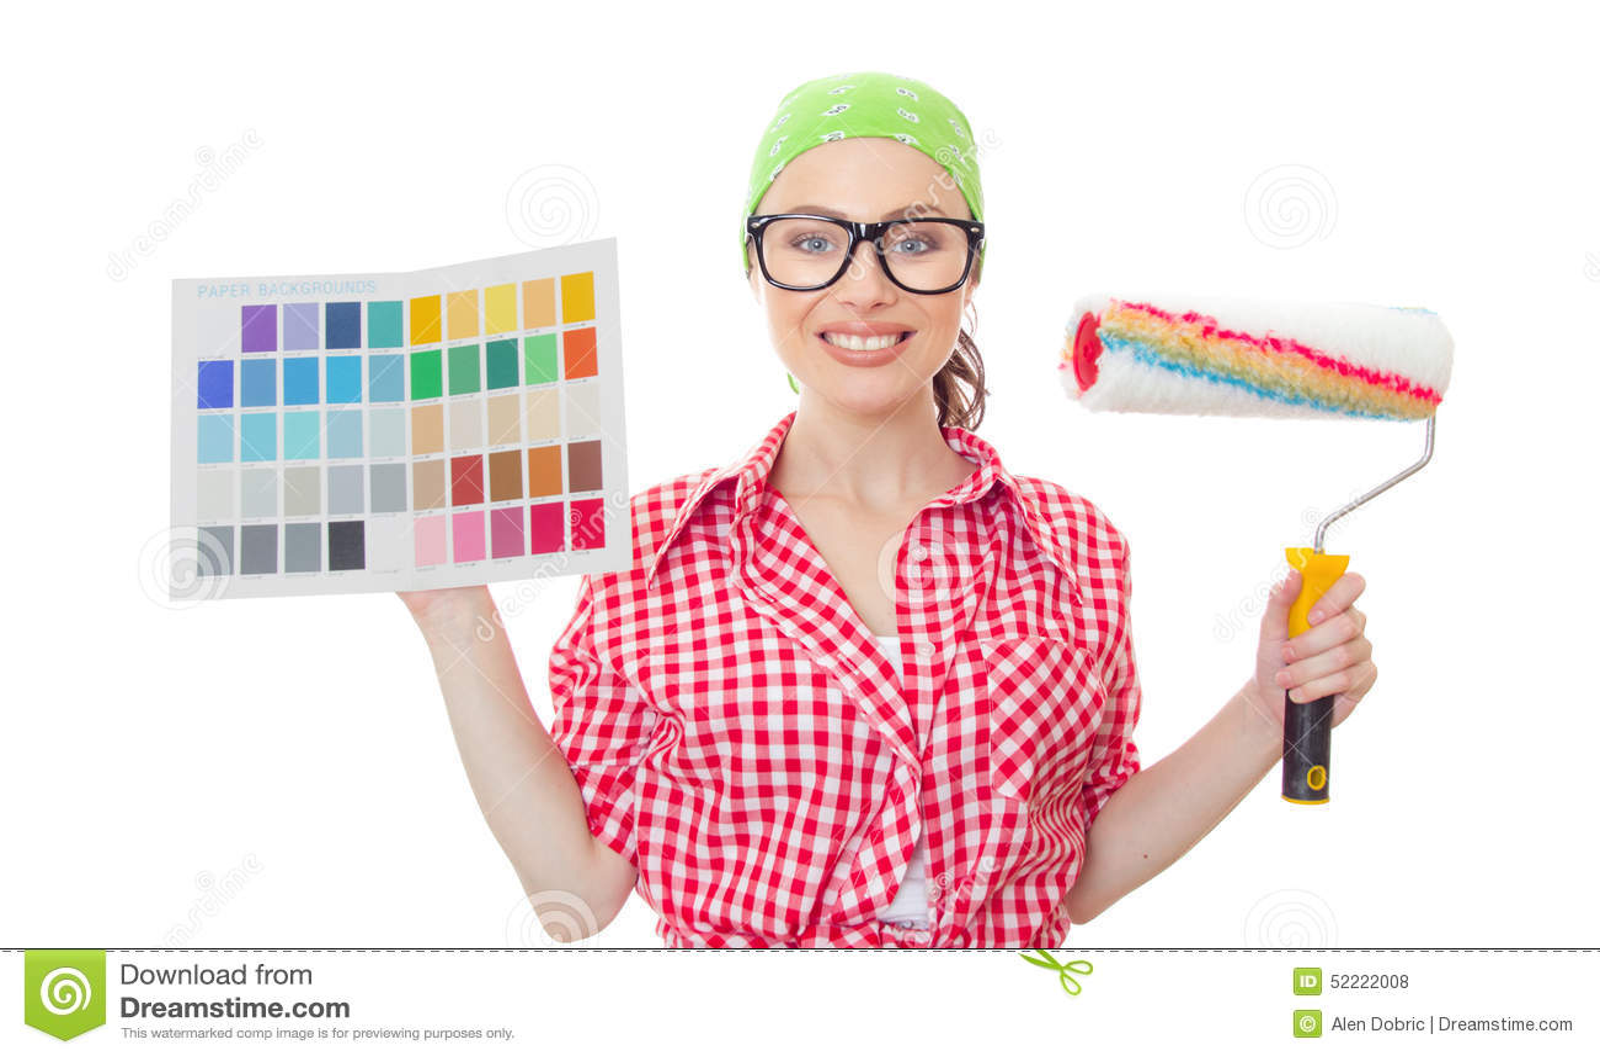 House painter woman stock photo. Image of decision, pantone - 52222008